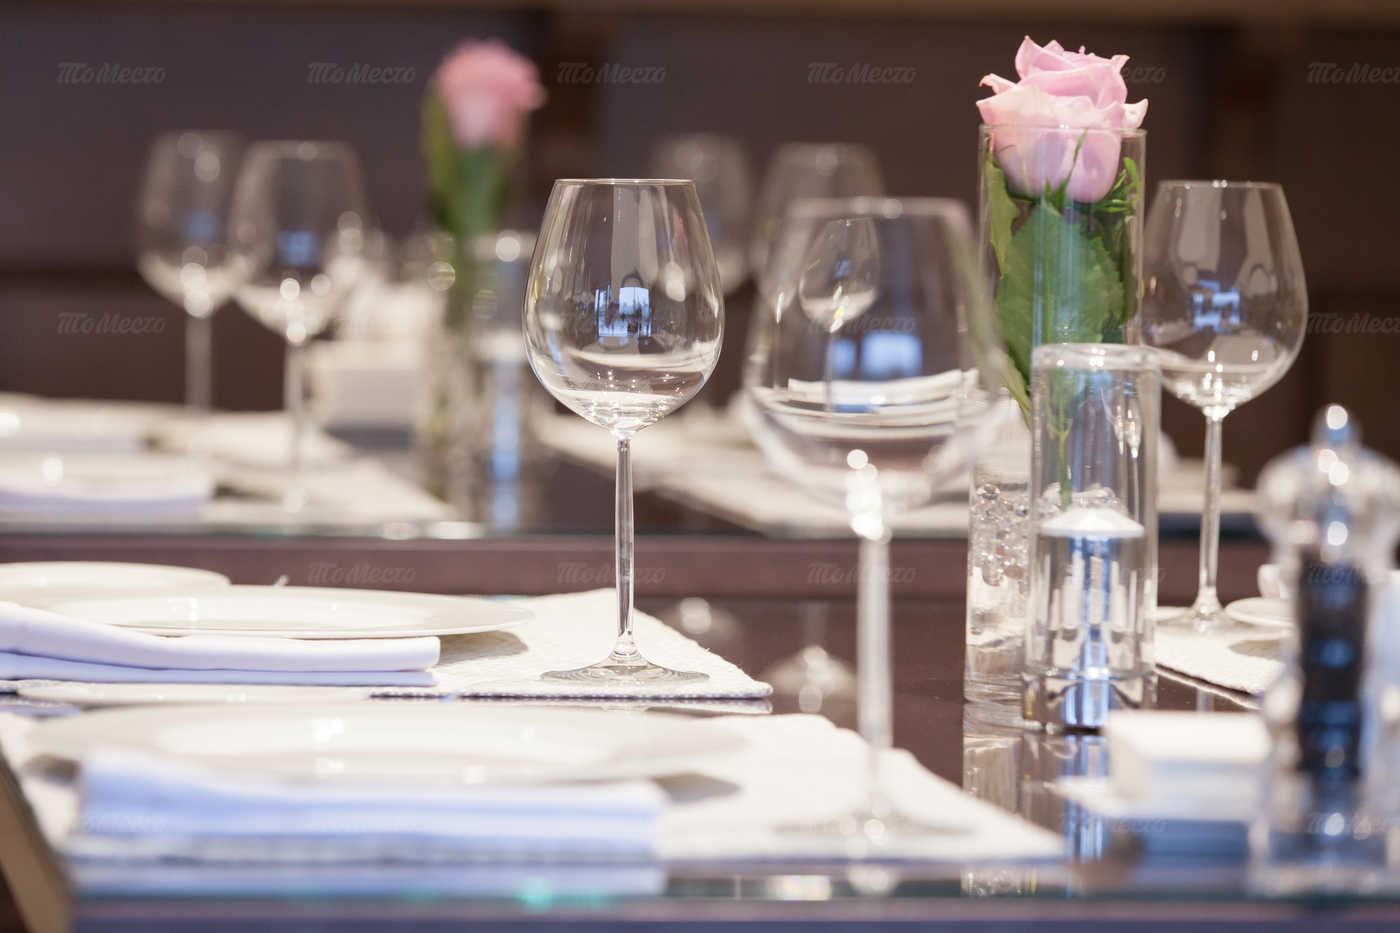 Меню ресторана Langust (Лангуст) на Малом проспекте П.С.